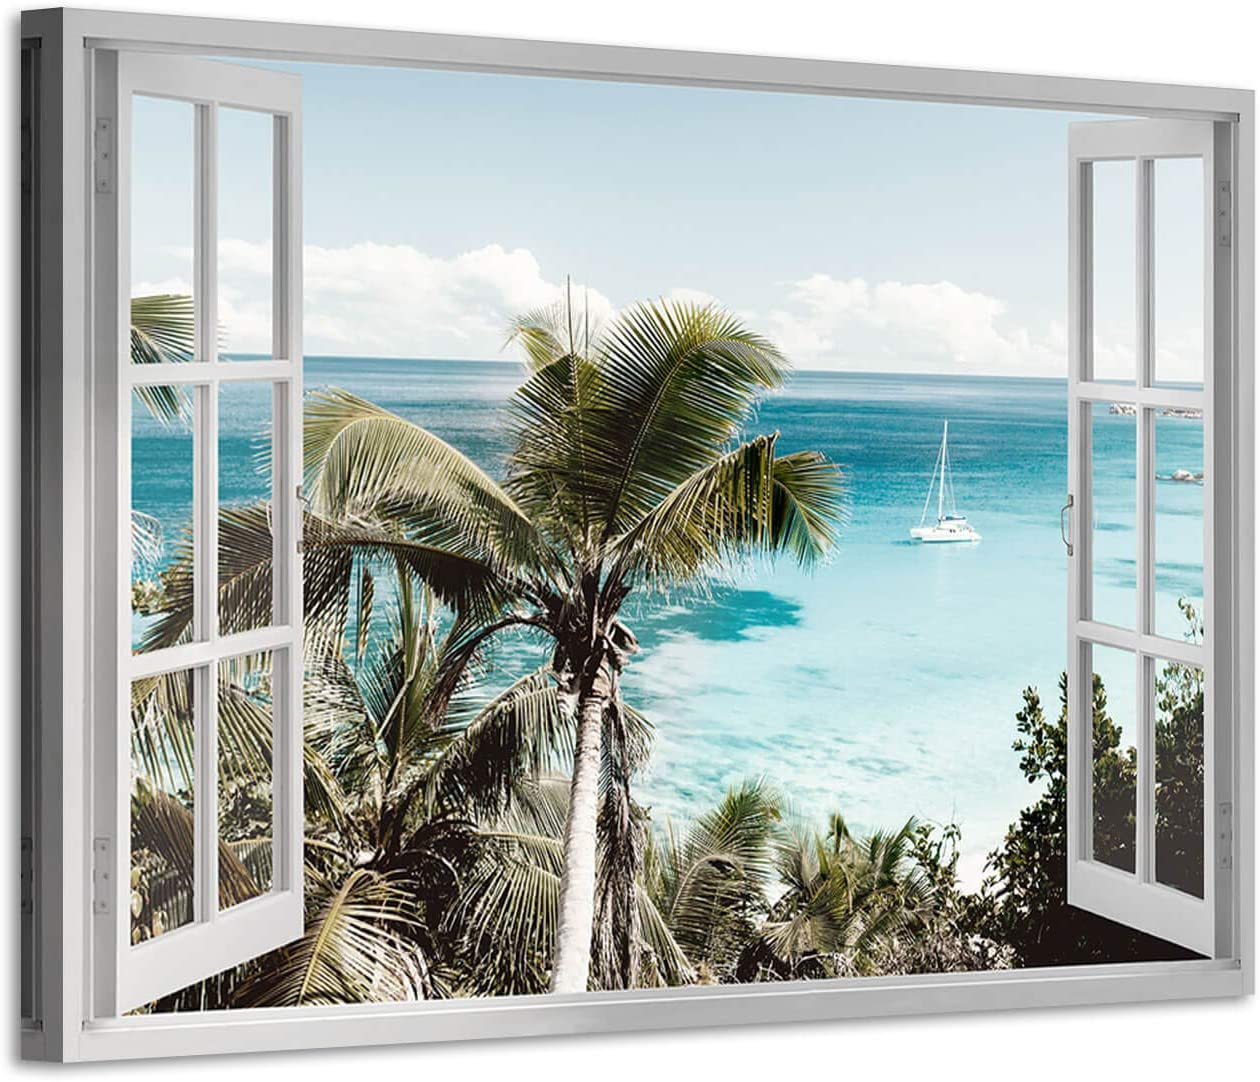 Wall Canvas Art Blue Sky Beach Coconut Tree Out of Window Art Print on Canvas